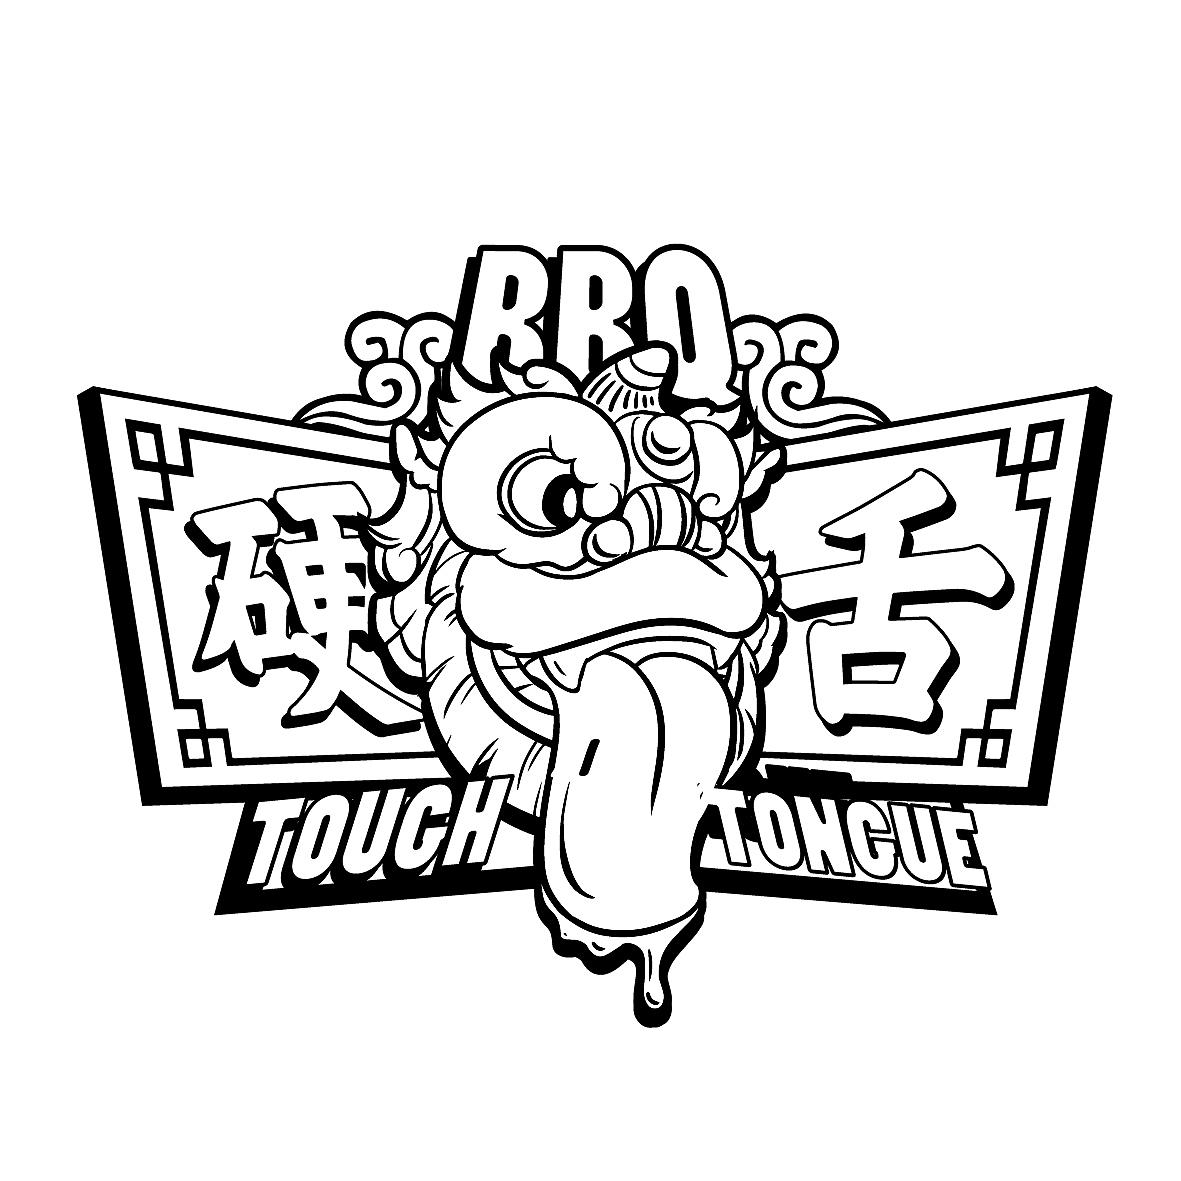 手绘卡通logo